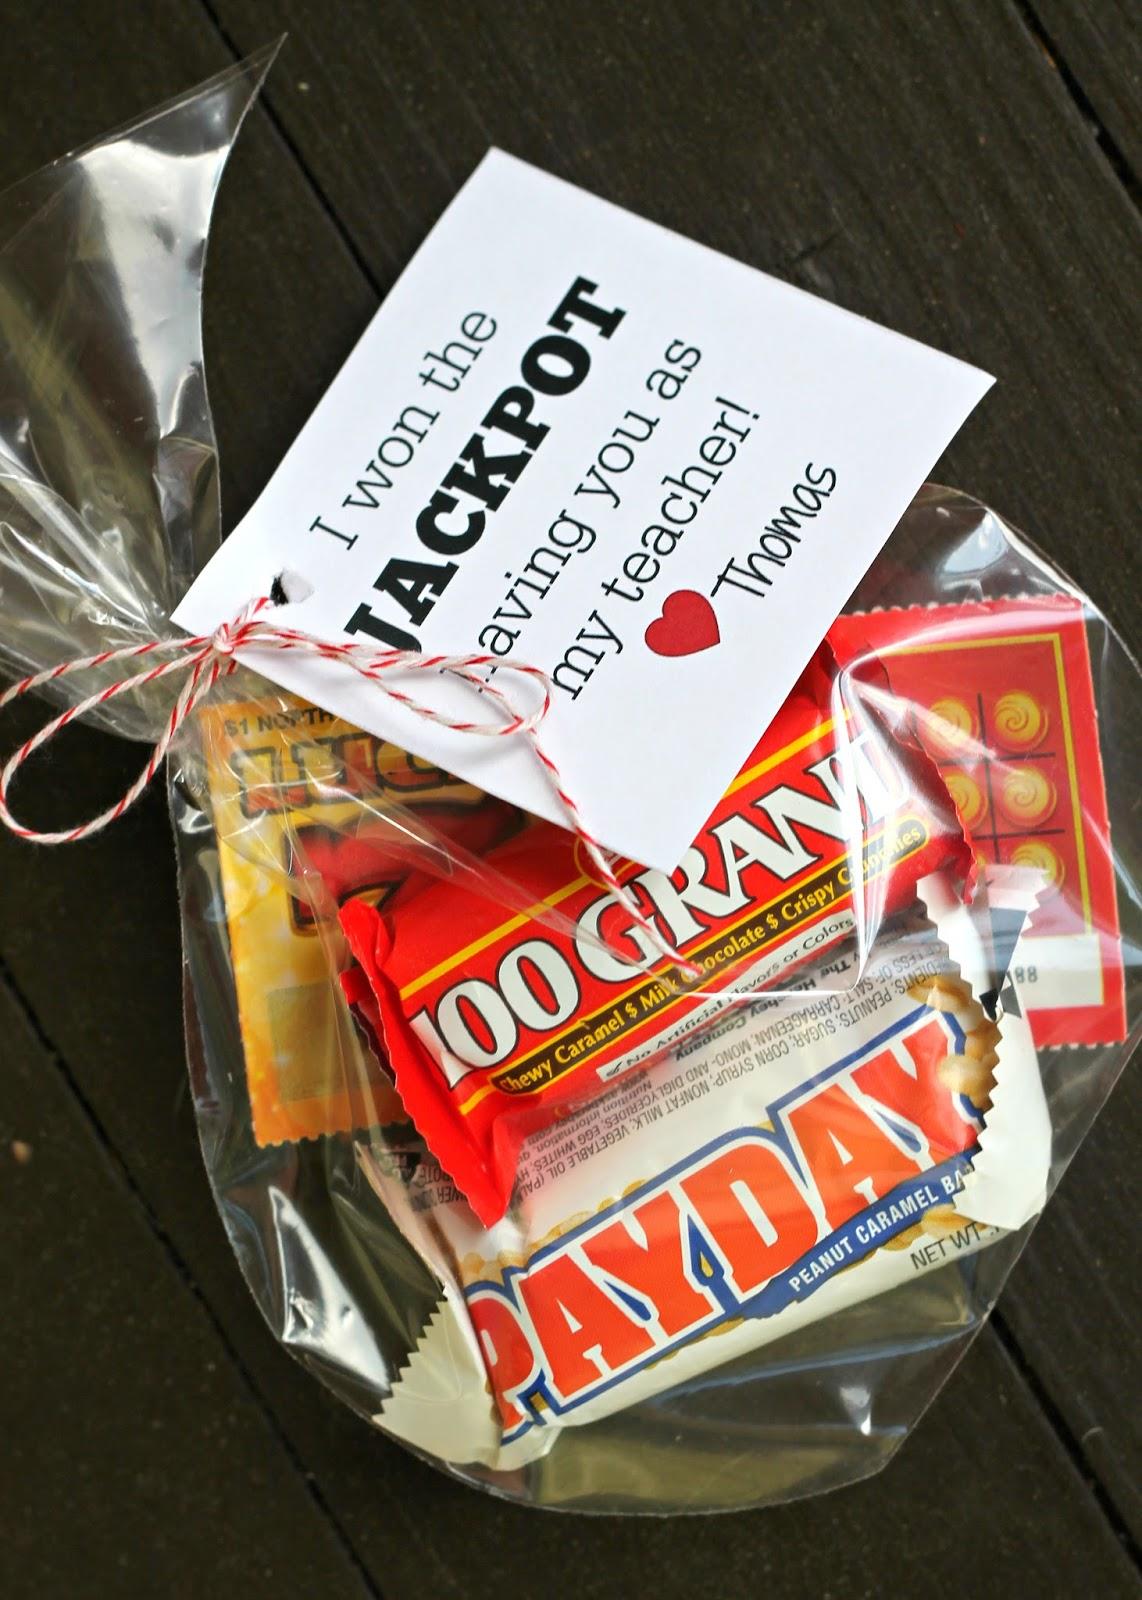 Valentine's Day Gifts - Carolina Charm